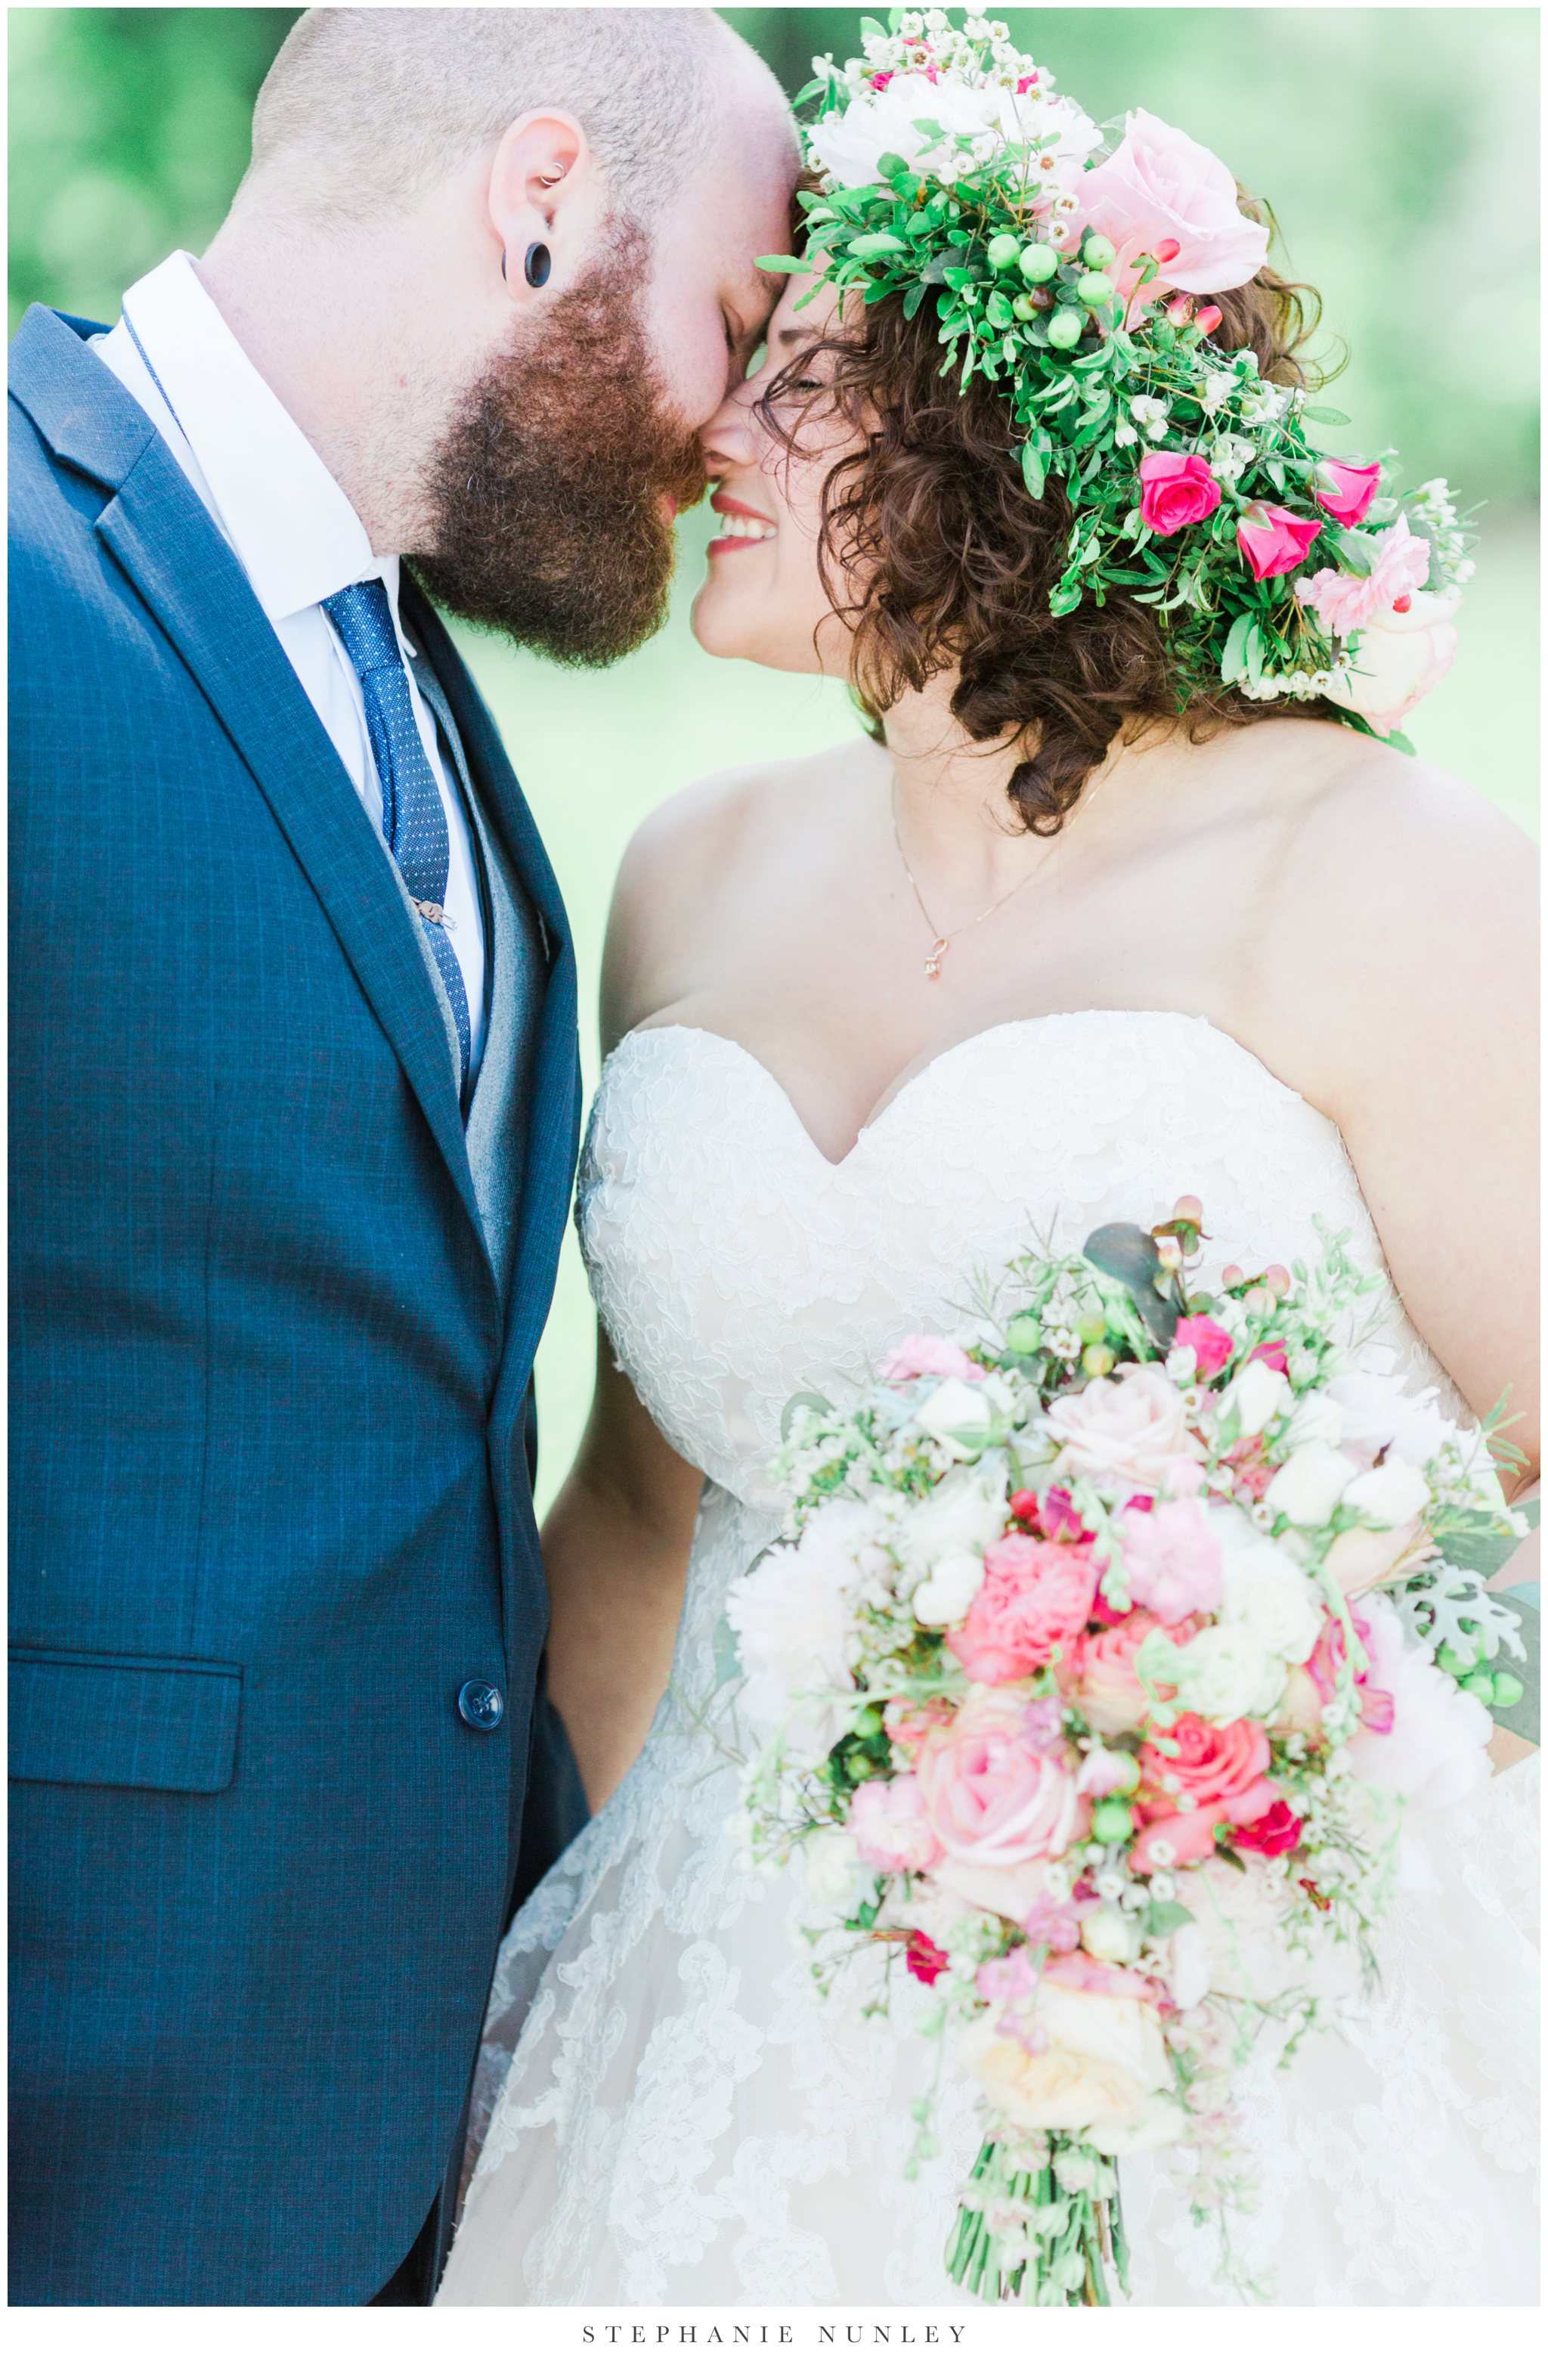 romantic-outdoor-wedding-with-flower-crown-0058.jpg